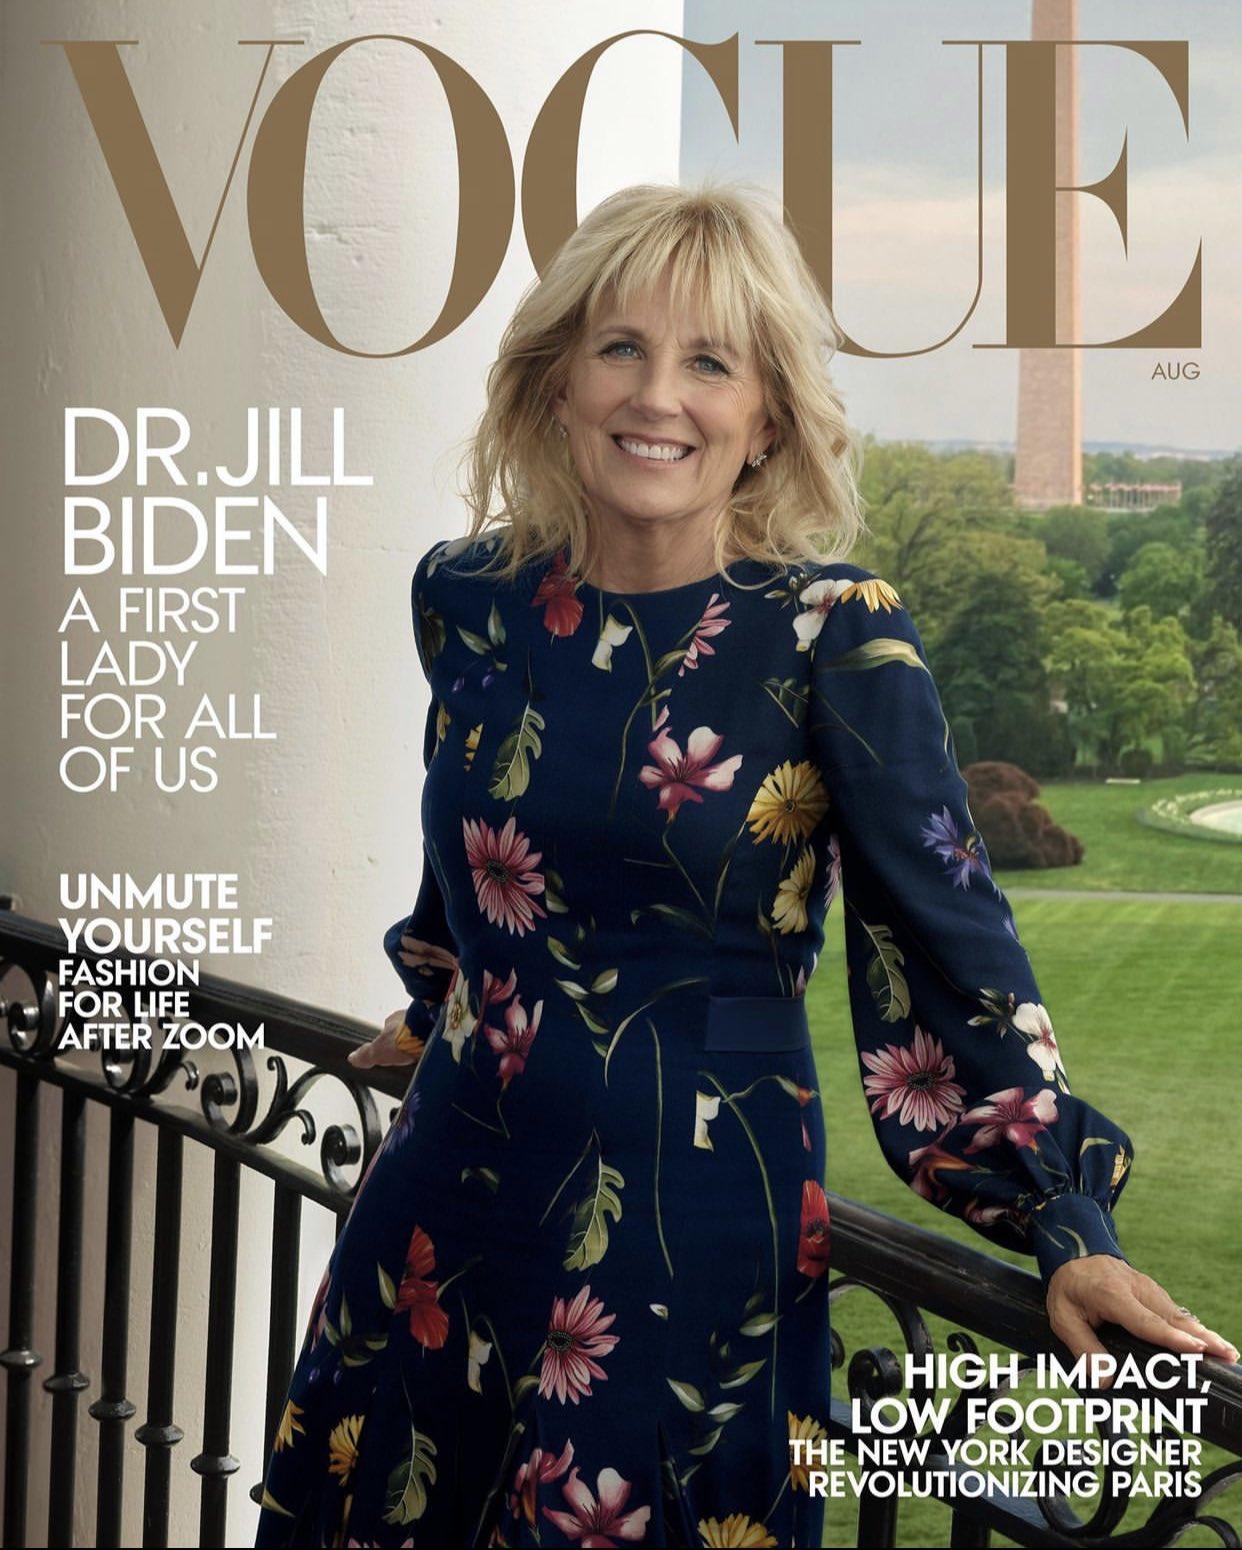 first-lady-jill-biden-wears-oscar-de-la-renta-for-cover-of-vogue-shot-by-annie-leibovitz